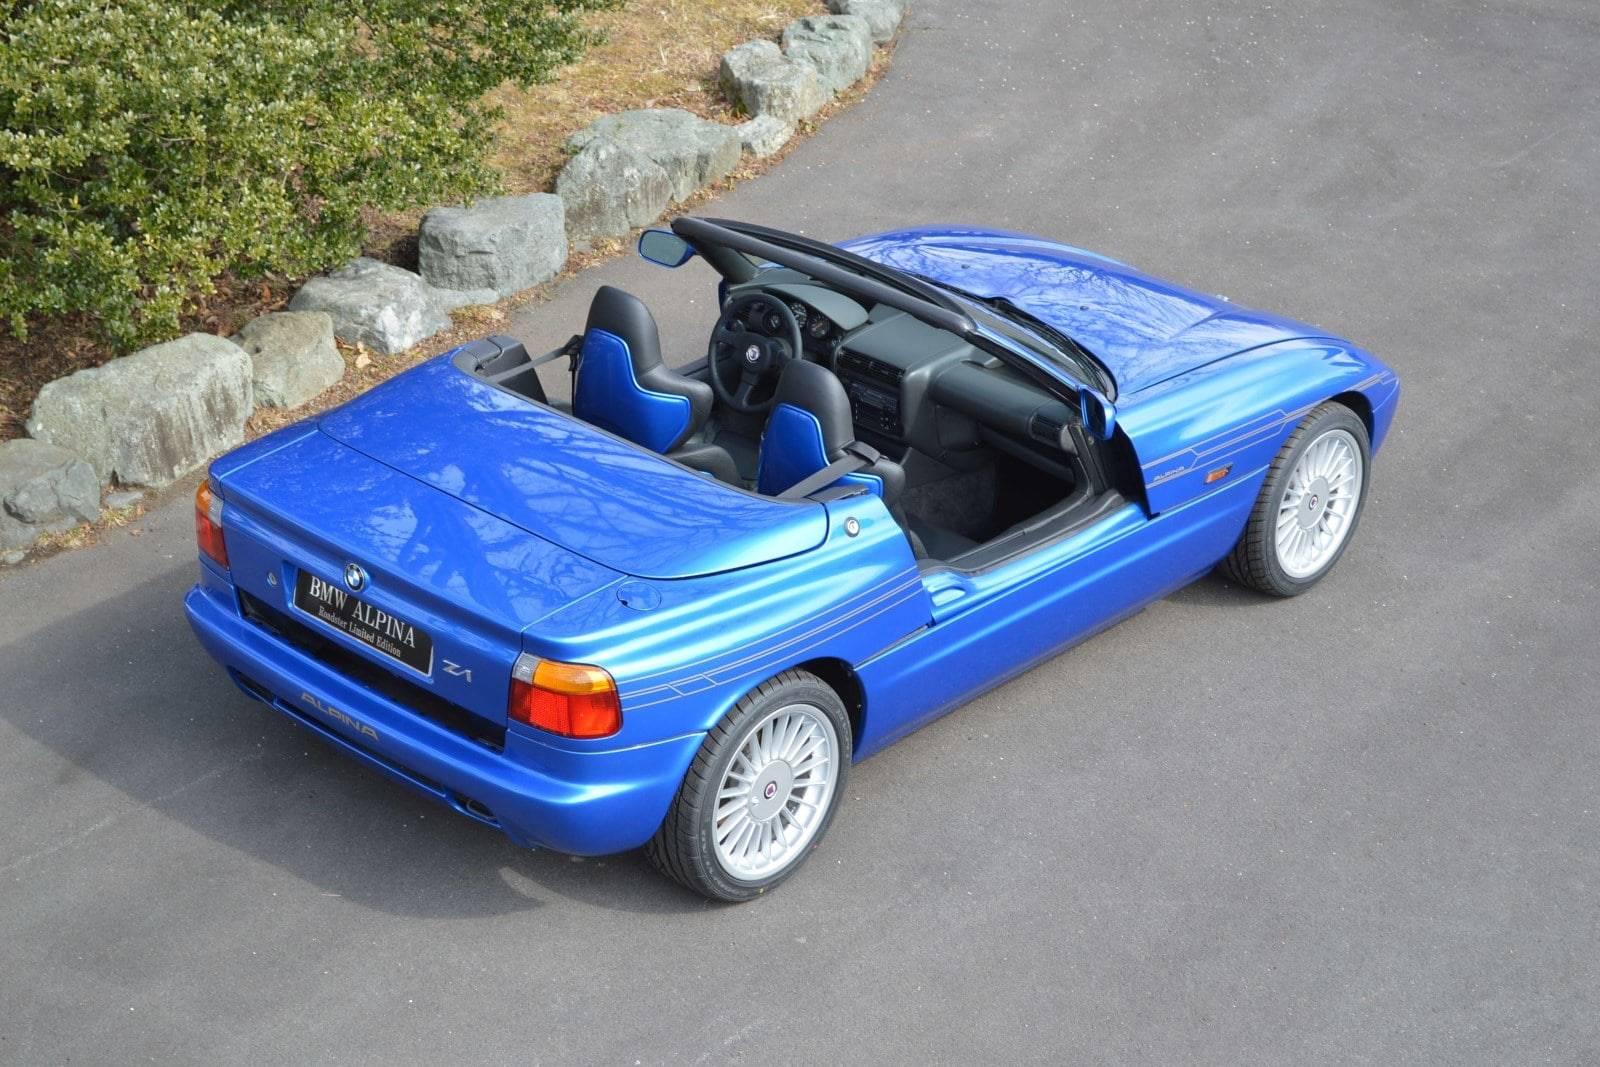 30-летие BMW ALPINA Roadster Limited Edition - BMW Z1 E30 4